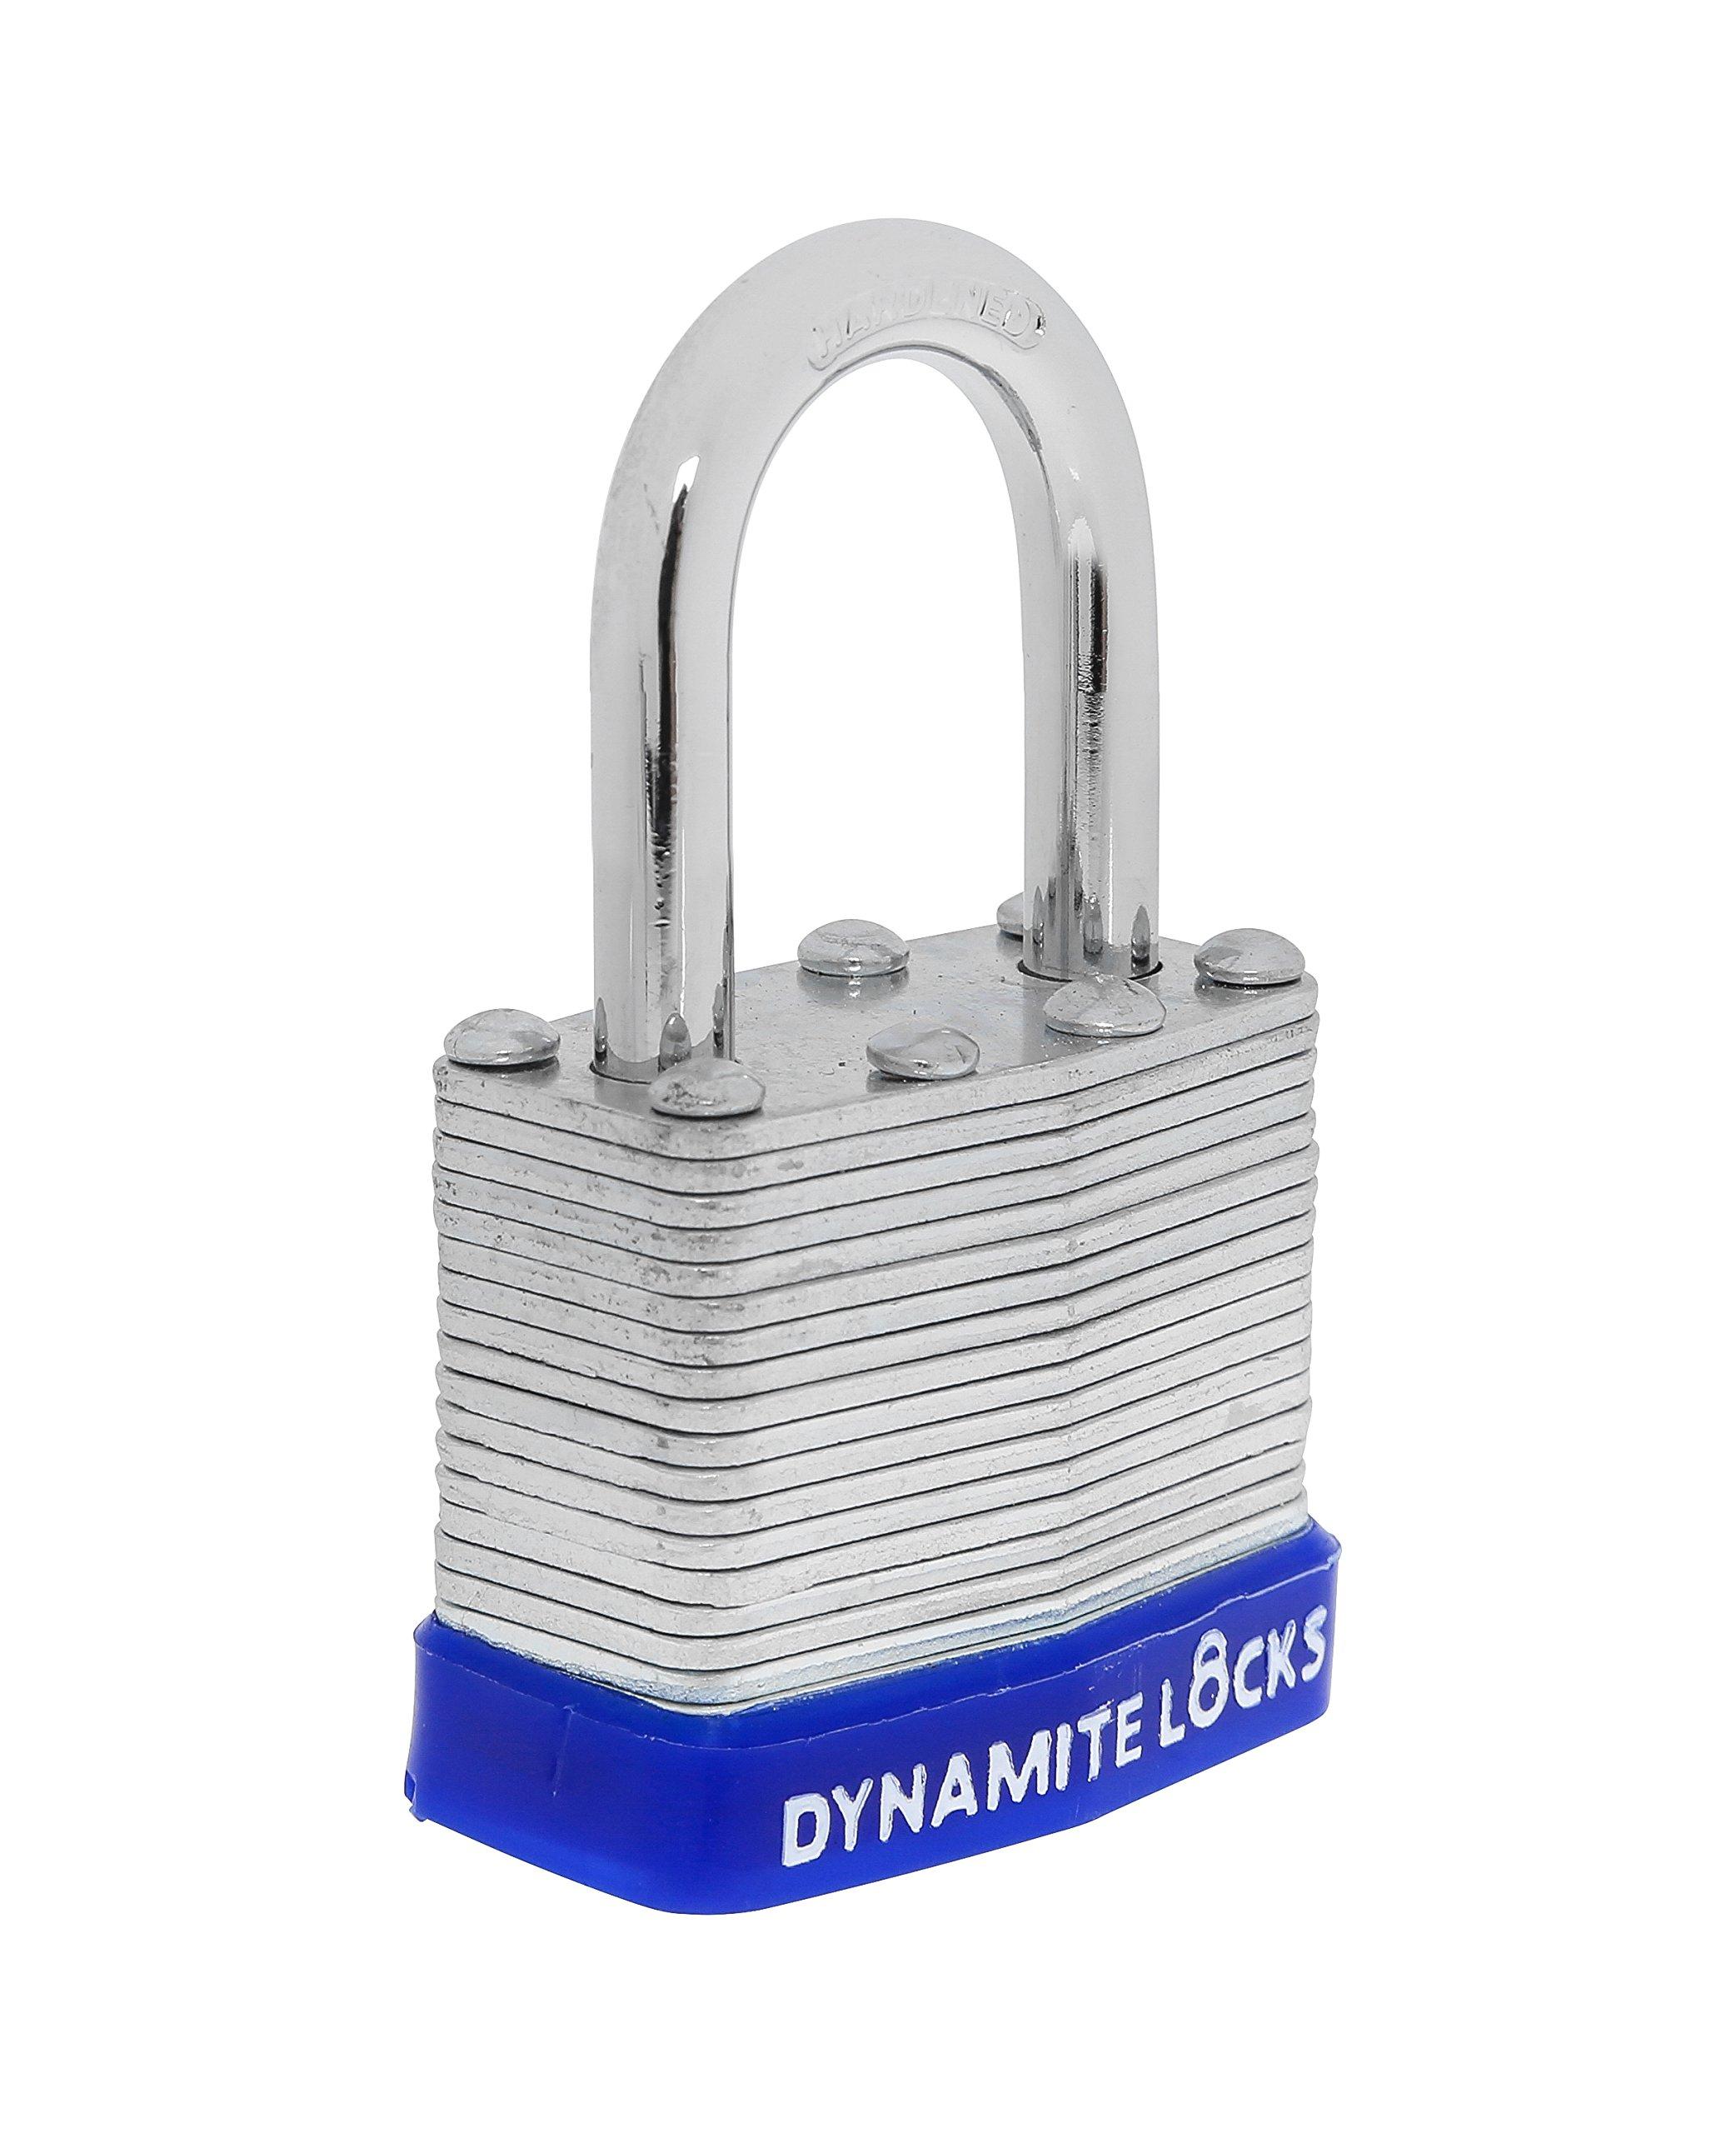 72 PC padlocks keyed alike 72-pack LAMINATED PADLOCK 40MM KEY ALIKE SHORT SHACKLE COMMERCIAL GRADE SECURITY PAD LOCKS PADLOCK KEYED THE SAME A LIKE by Dynamite Locks (Image #5)